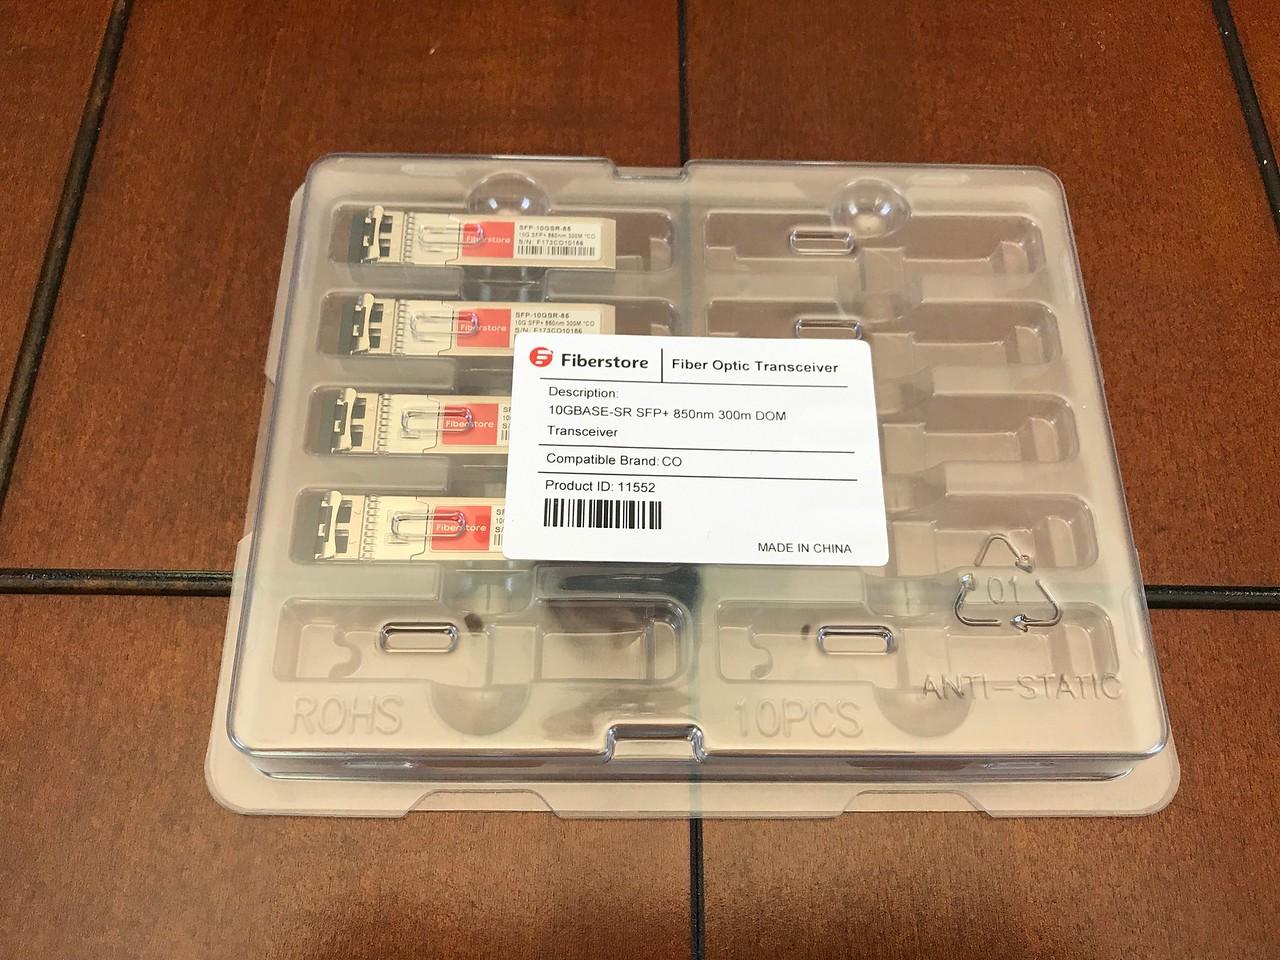 Chelsio-compatible transcievers from Fiberstore